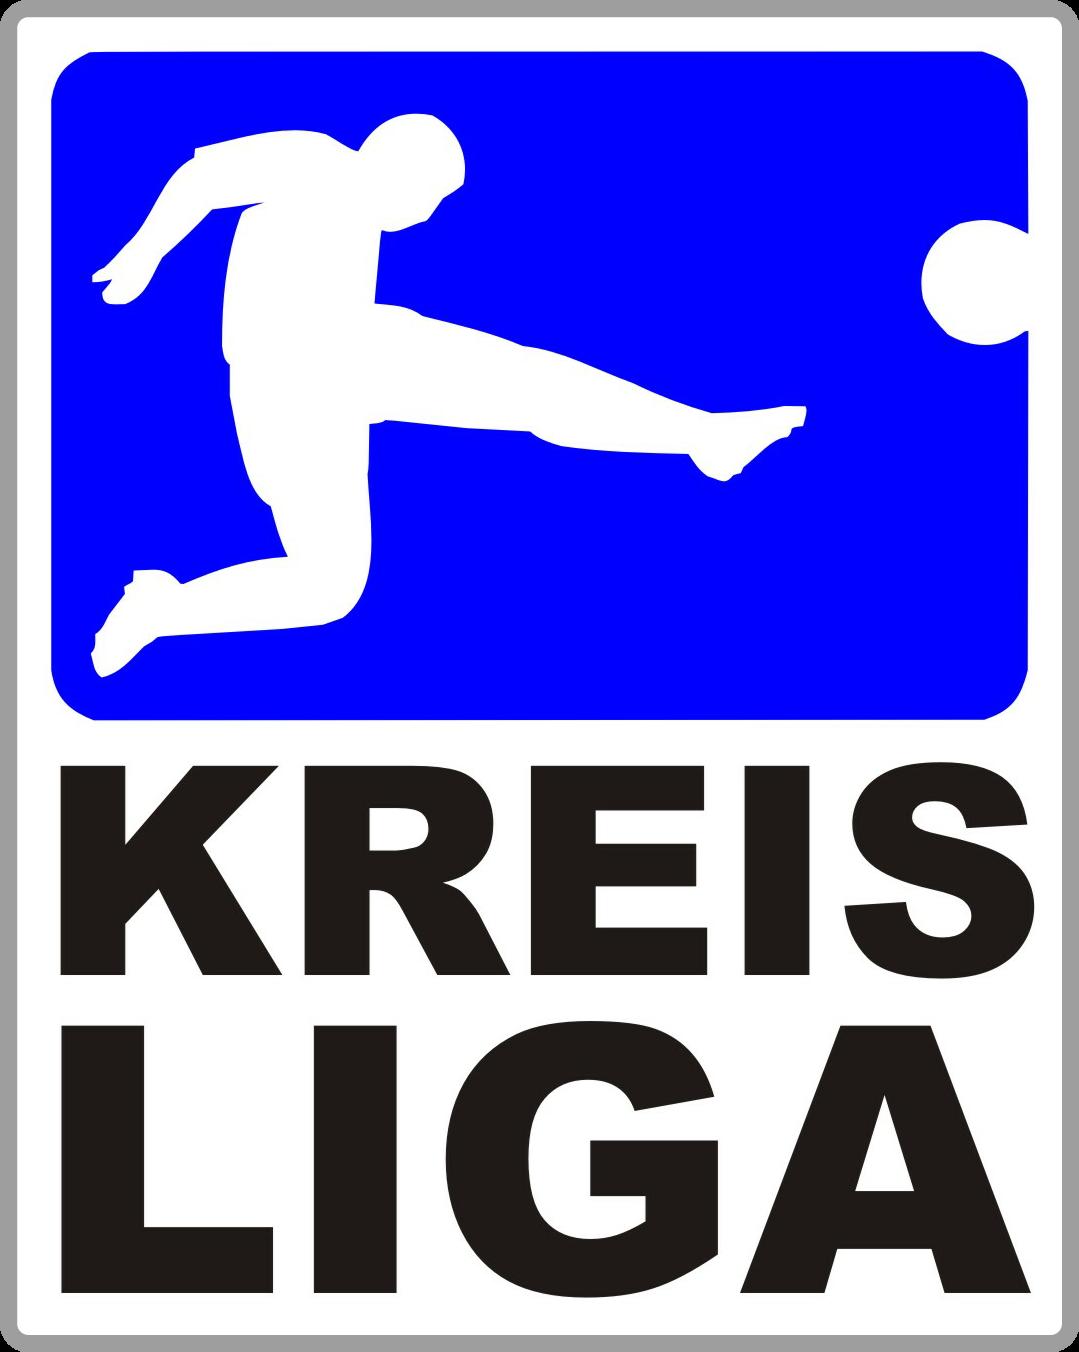 Kreisliga Kreis Fussball Buli